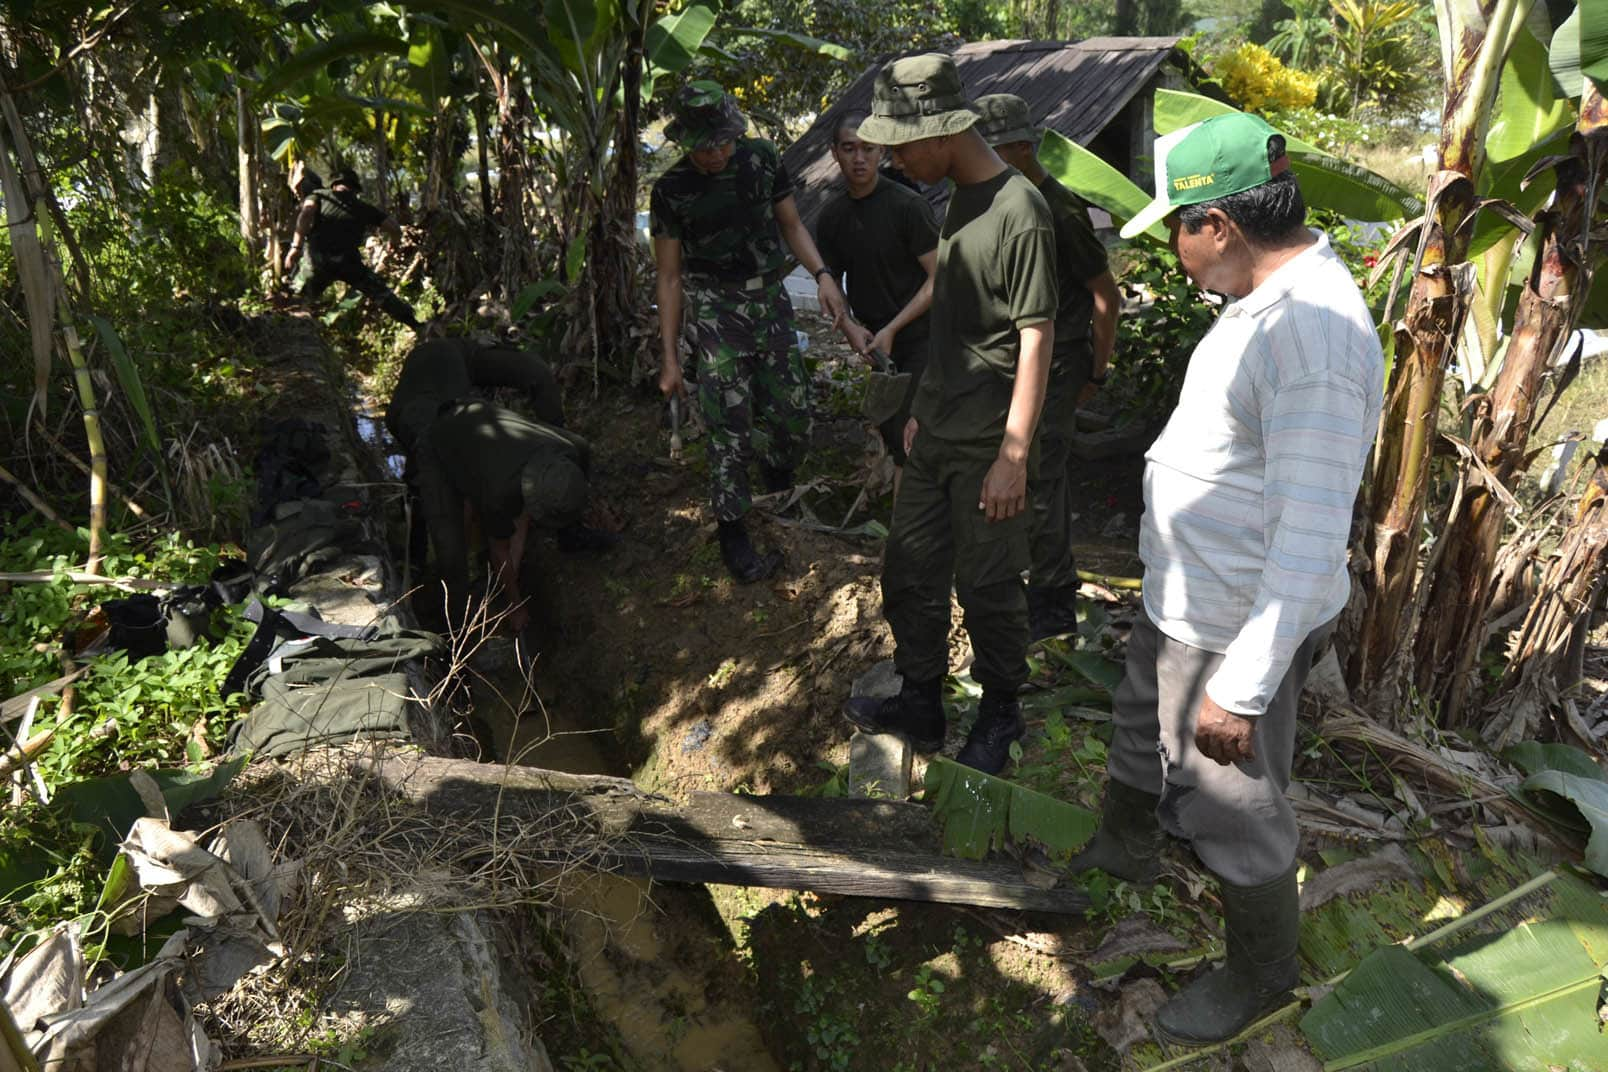 Yonif 643/Wns bersama Warga Karya Bhakti Perbaikan Parit dan Bersihkan Makam